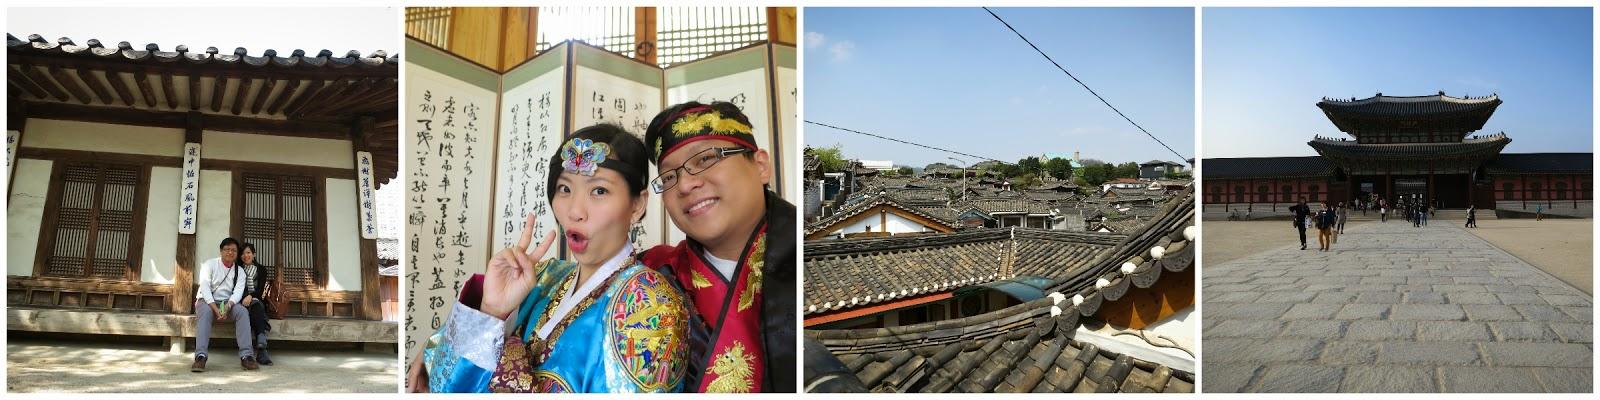 http://jeffieshannie.blogspot.sg/2014/06/seoul-jeju-day-8-insadong-samcheongdong.html